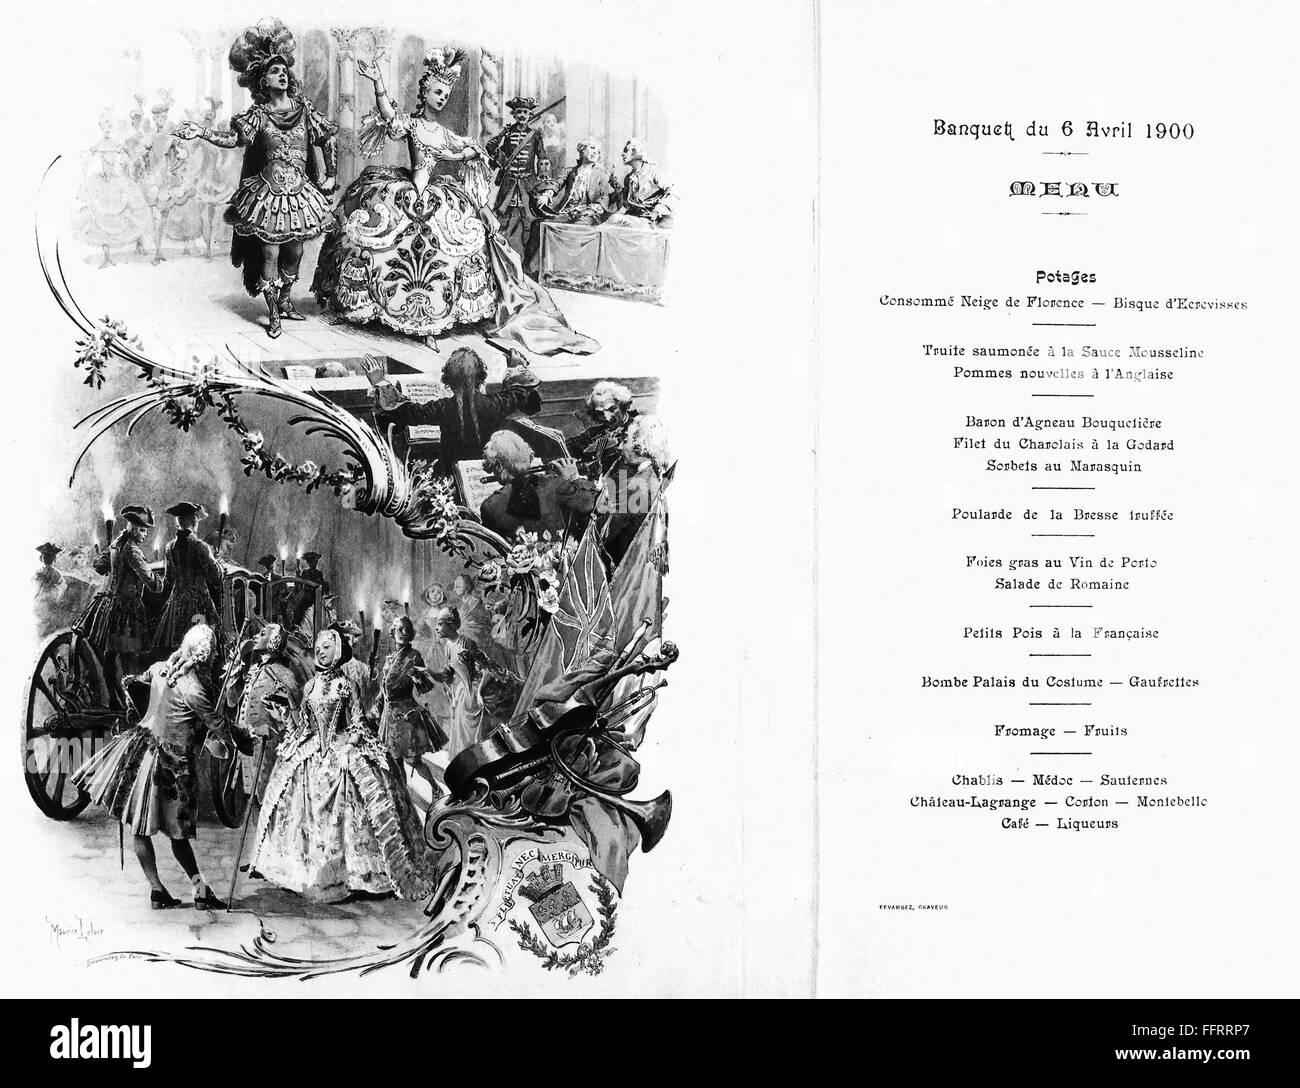 FRANCE: MENU, 1900  /nMenu for a banquet held at the